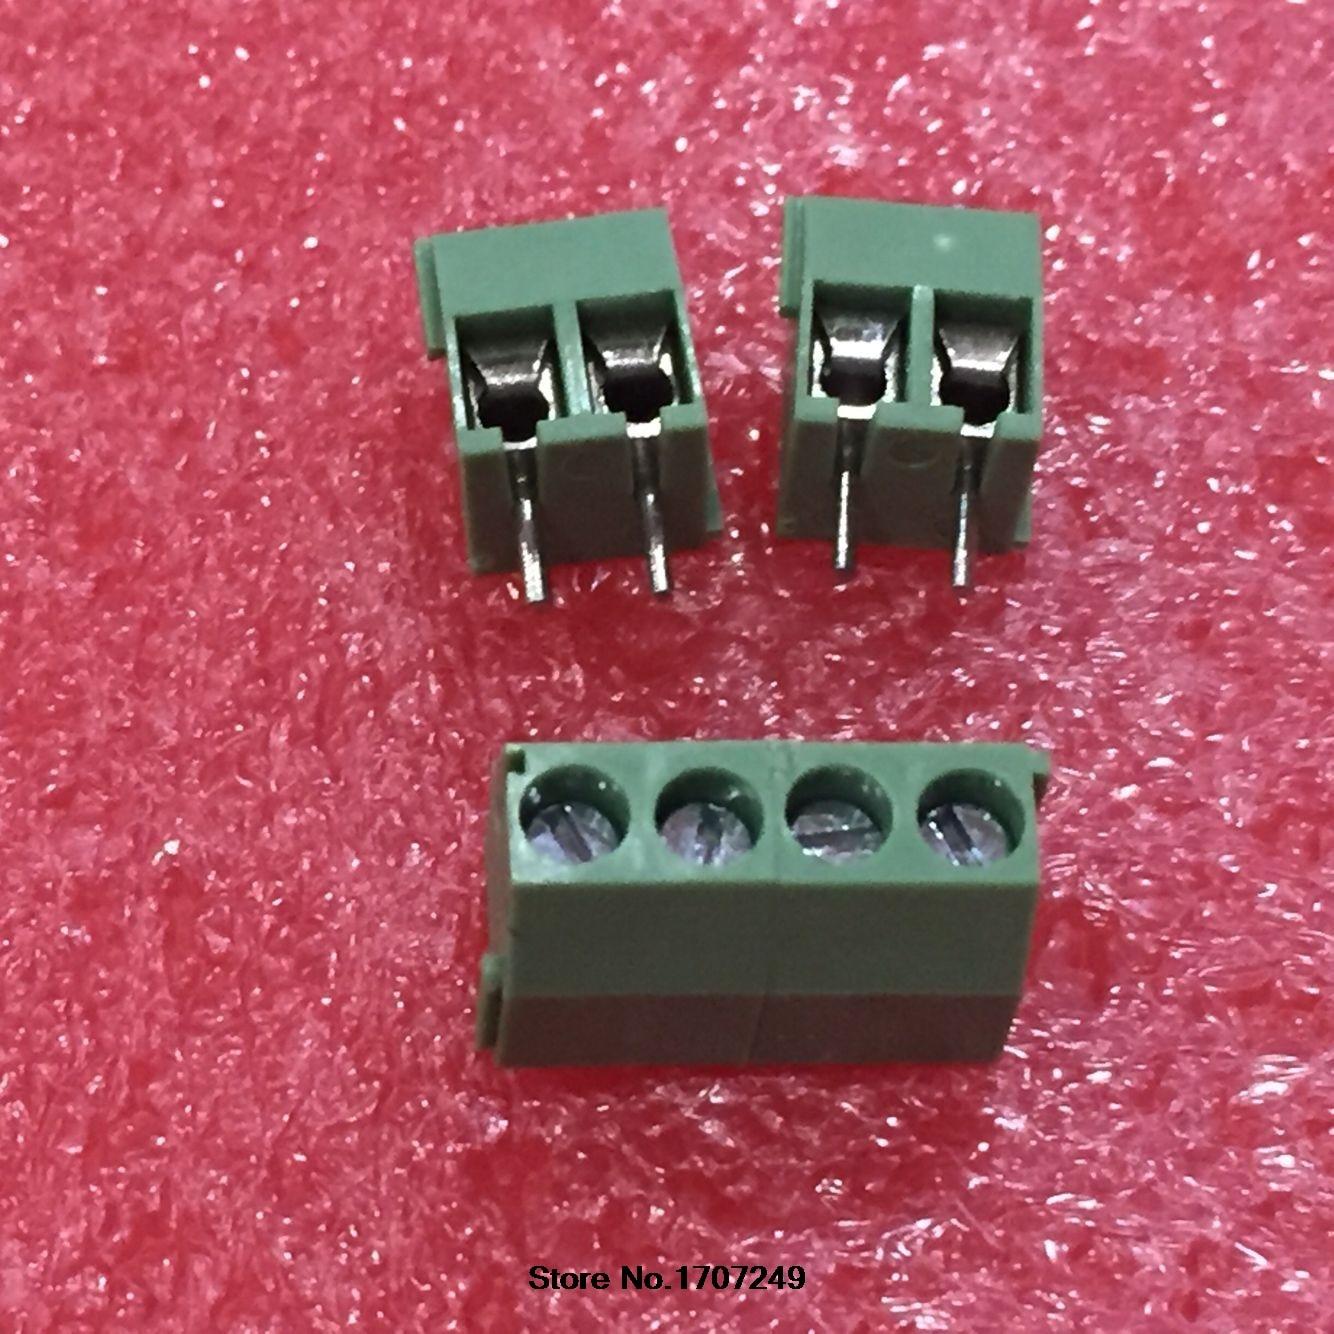 Analytisch 500 Stks Kf350-3.5-2p Kf350-2p Kf350 2pin 3.5mm Hoge Kwaliteit Milieu Koperen Voeten Straight Pin Pcb Schroefklemmenblok